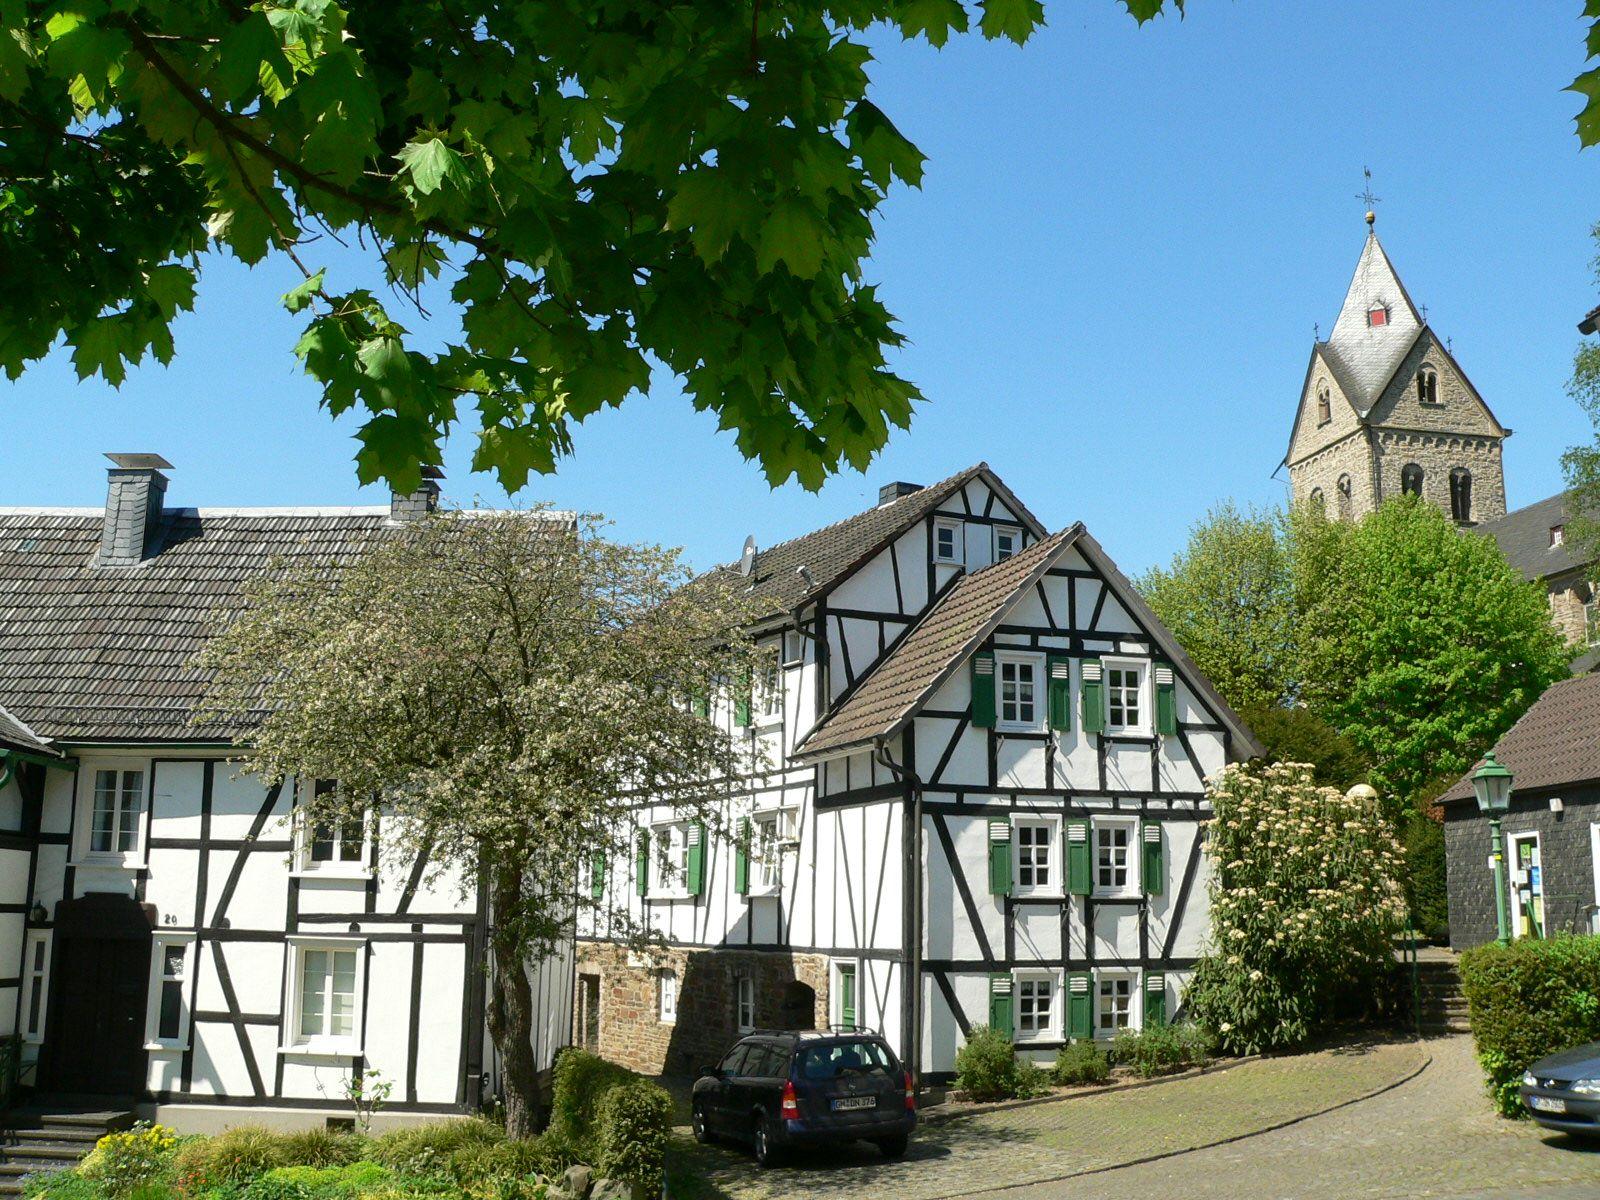 Morsbach_Basilika_Fachwerkhäuser_00.00.2013_007FotoCBuchen